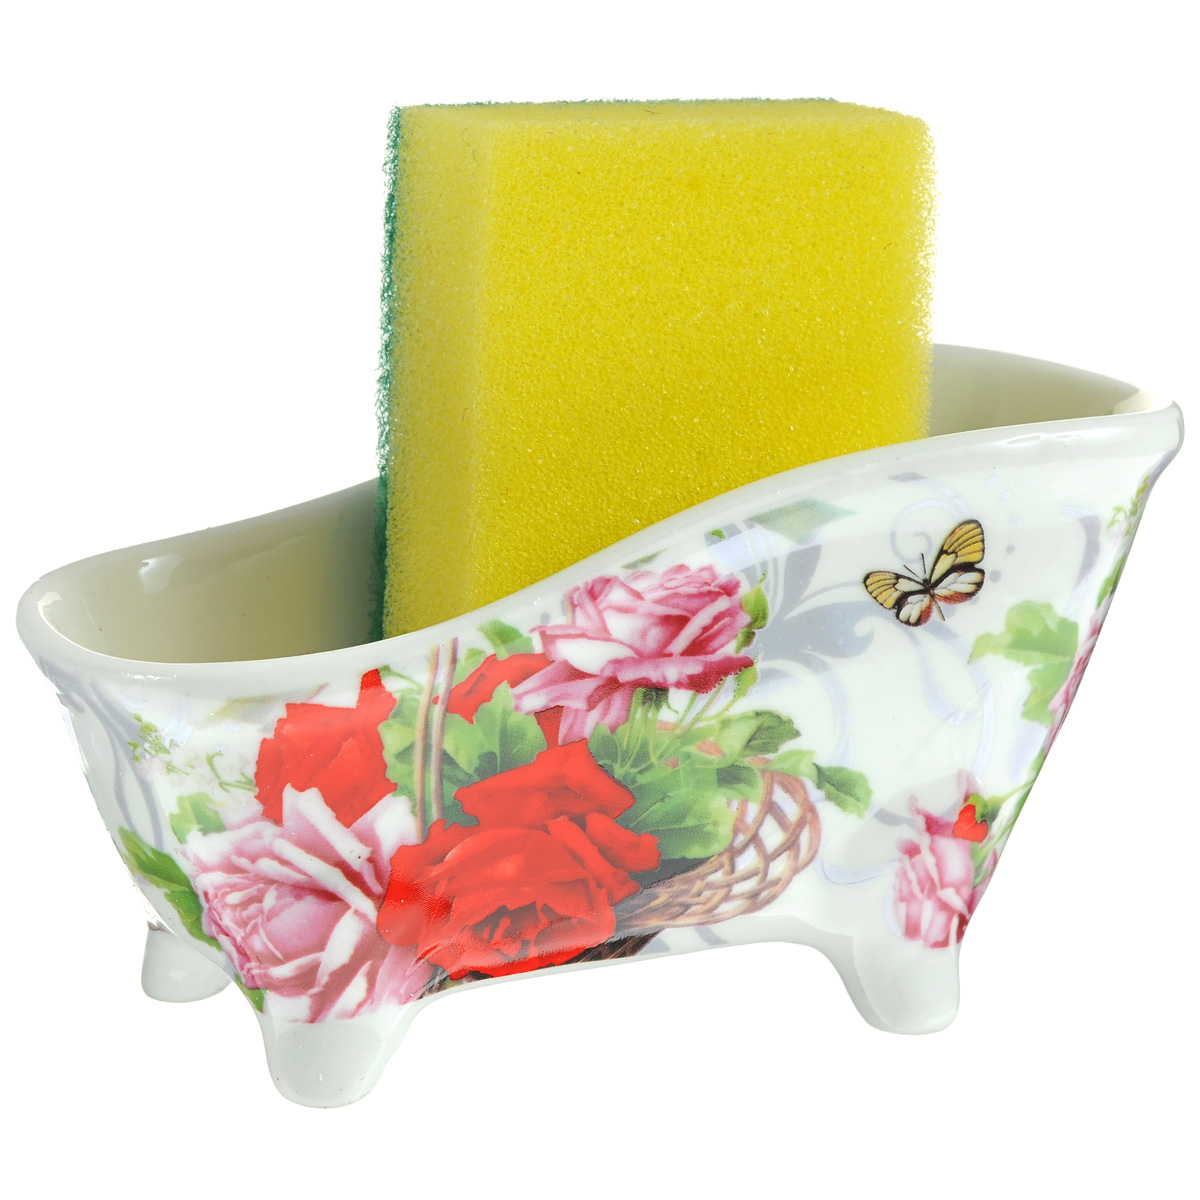 Набор для мытья посуды Besko Корзина роз, 2 предмета. 532-156